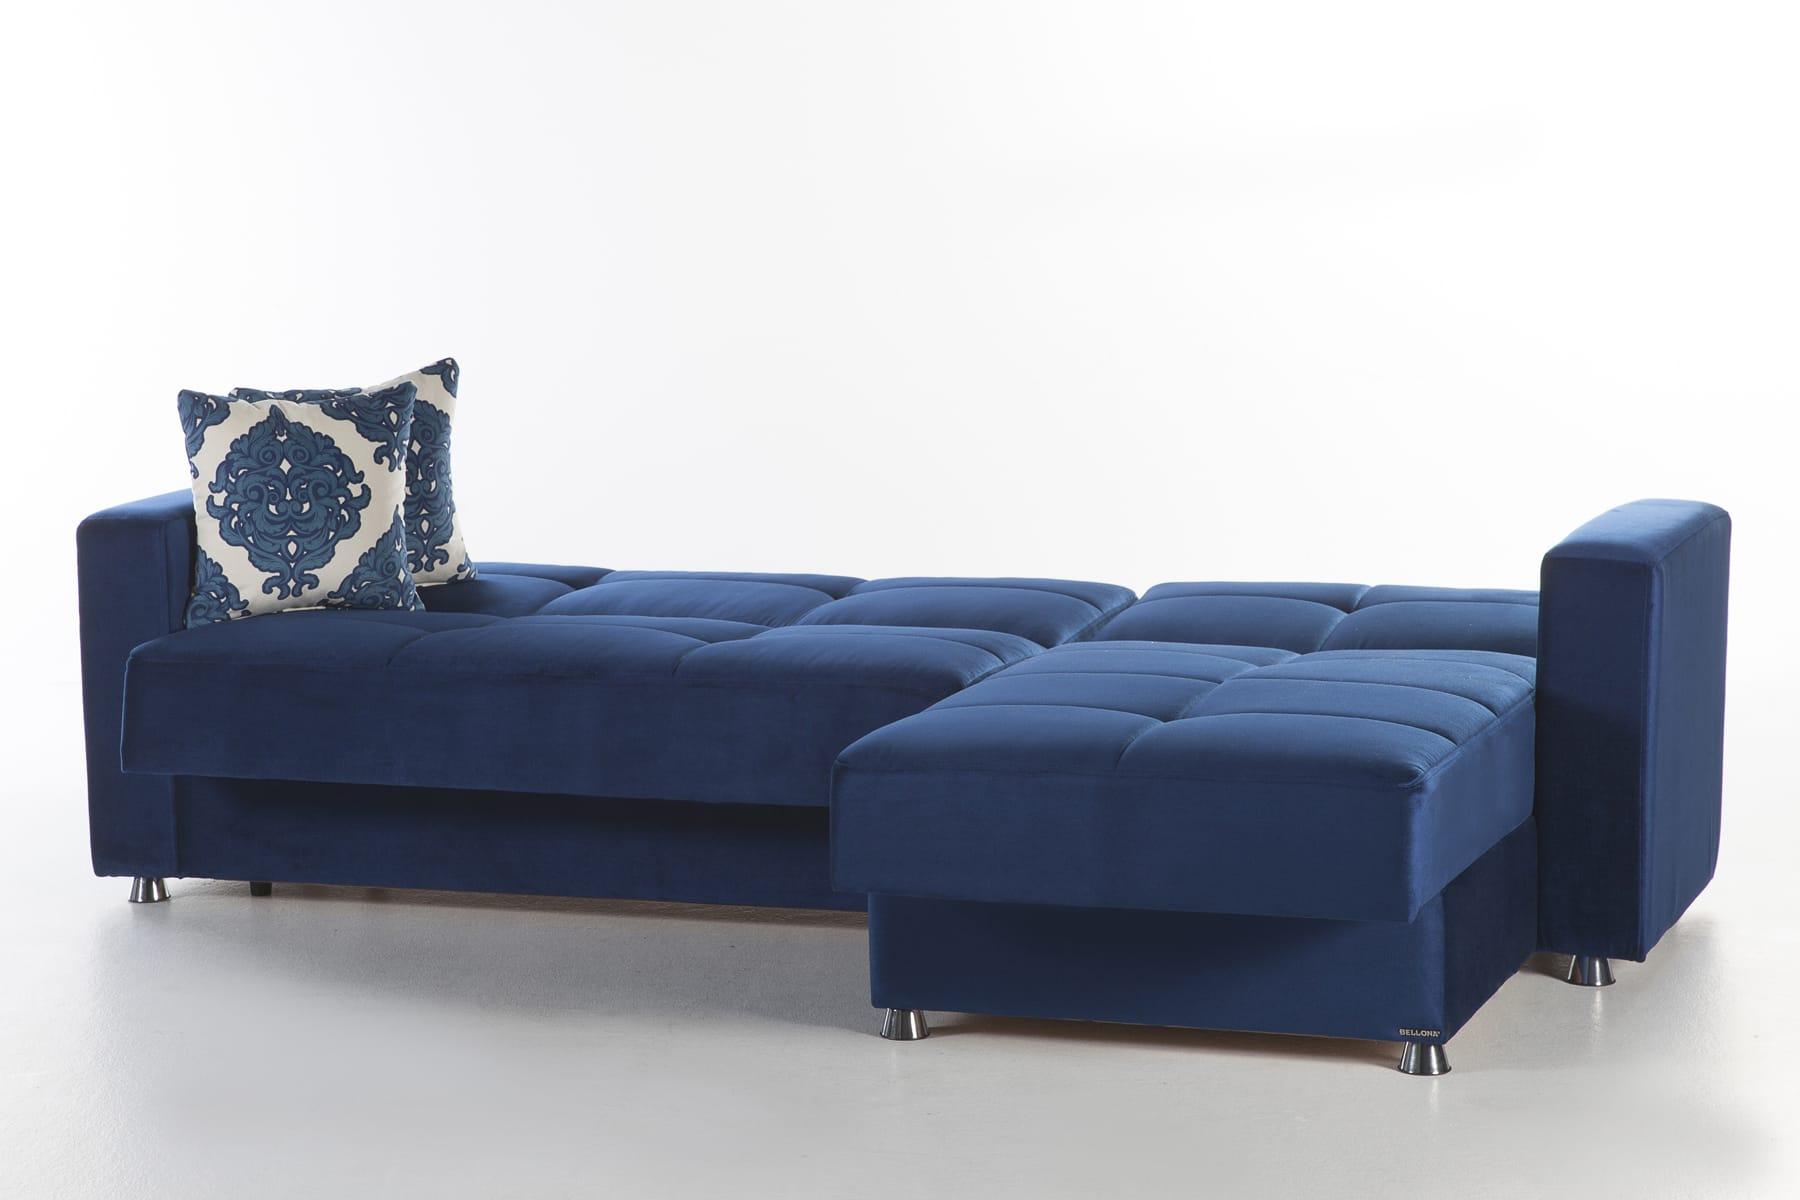 Elegant Roma Navy Sectional Sofa by Sunset